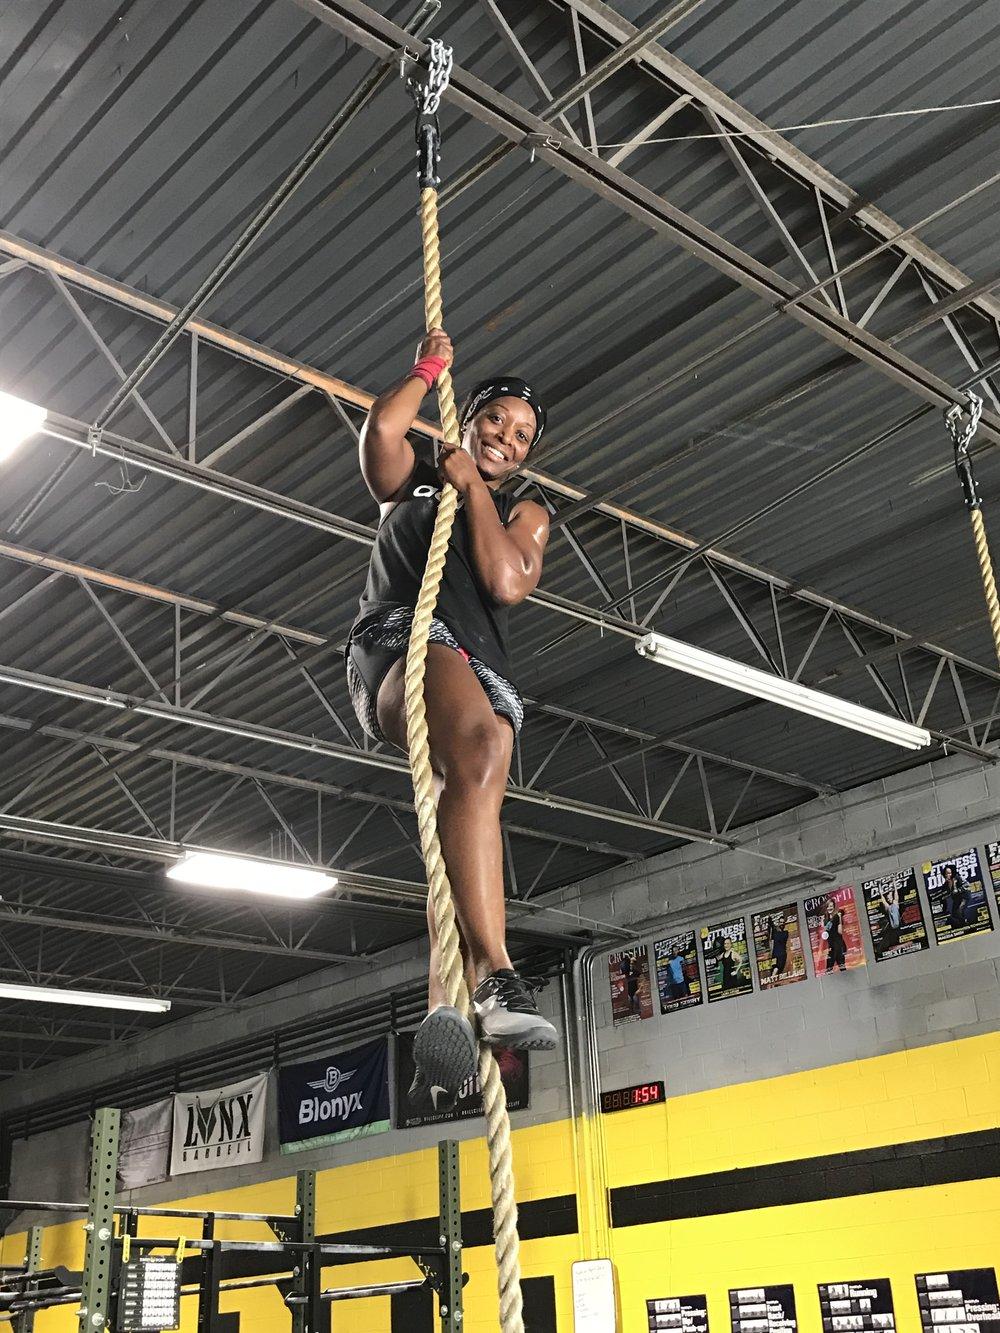 1st Rope Climb!